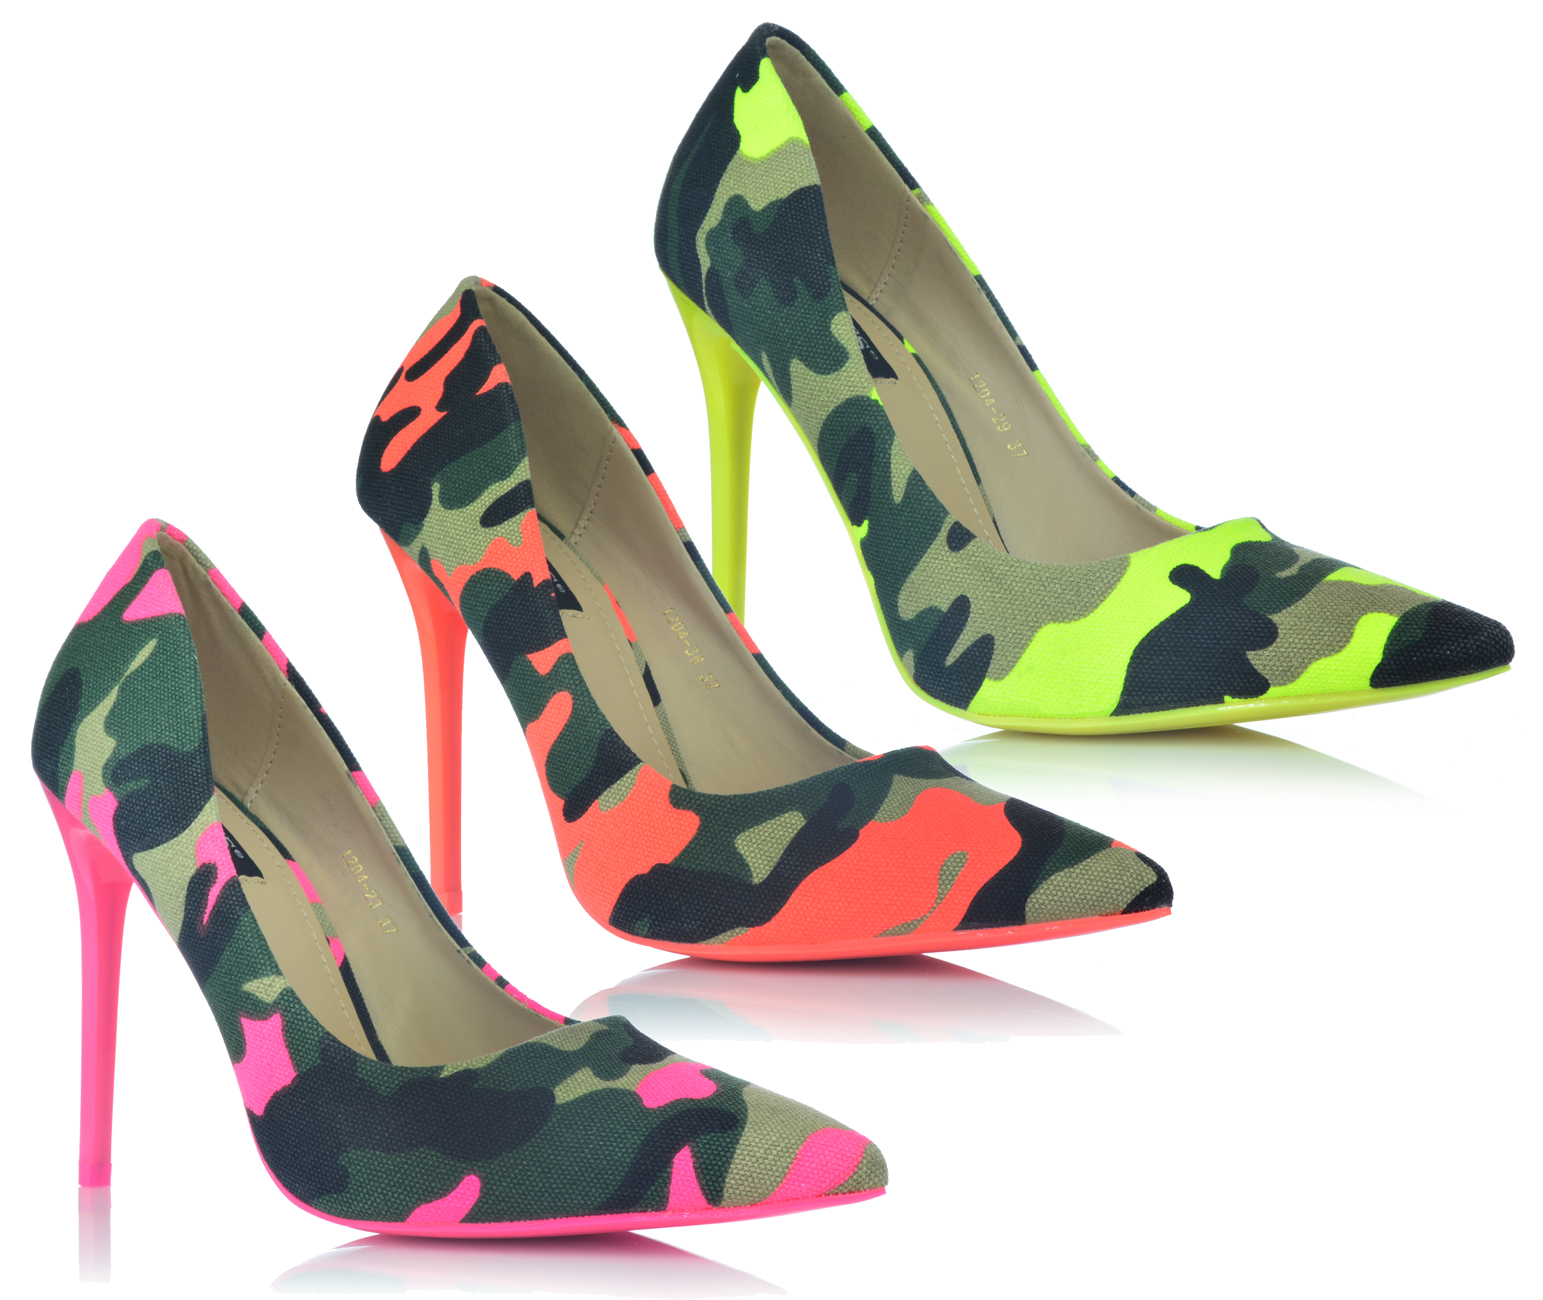 the latest d663b 73551 Camouflage High Heels Stiletto Pumps Neonfarben Abendschuhe Party Tarnung  35-40